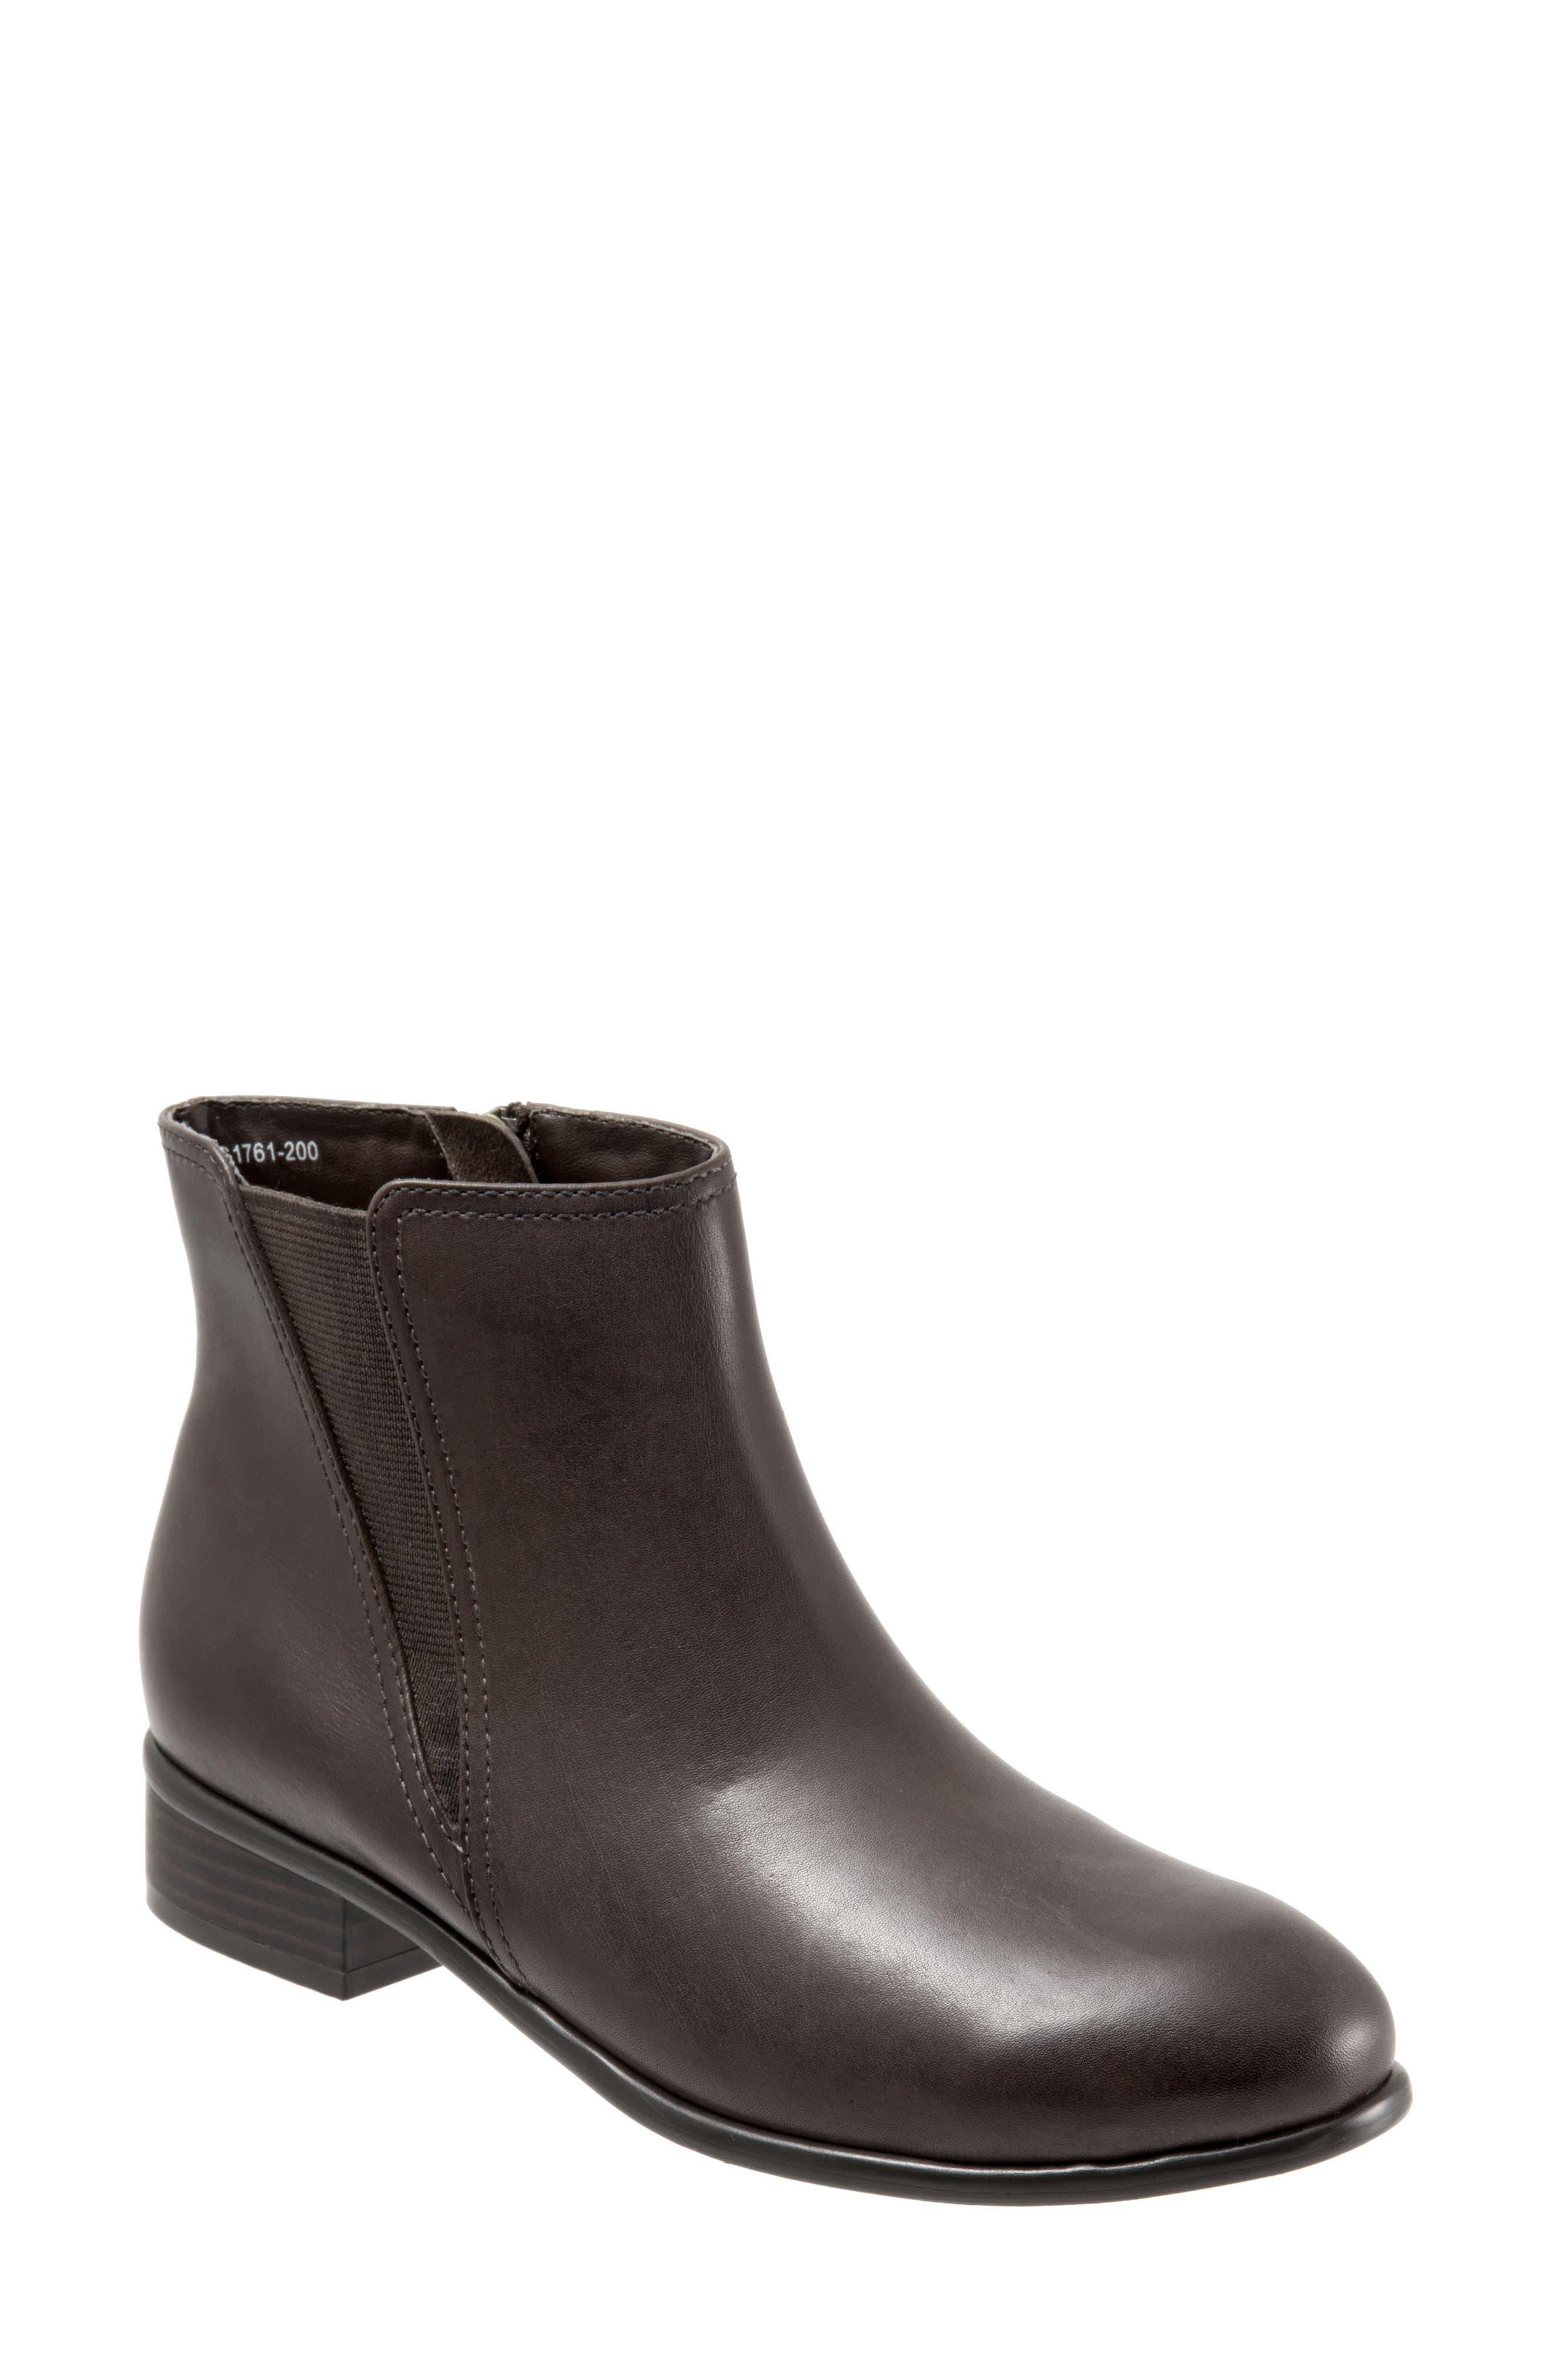 Urban Bootie,                         Main,                         color, Dark Brown Leather